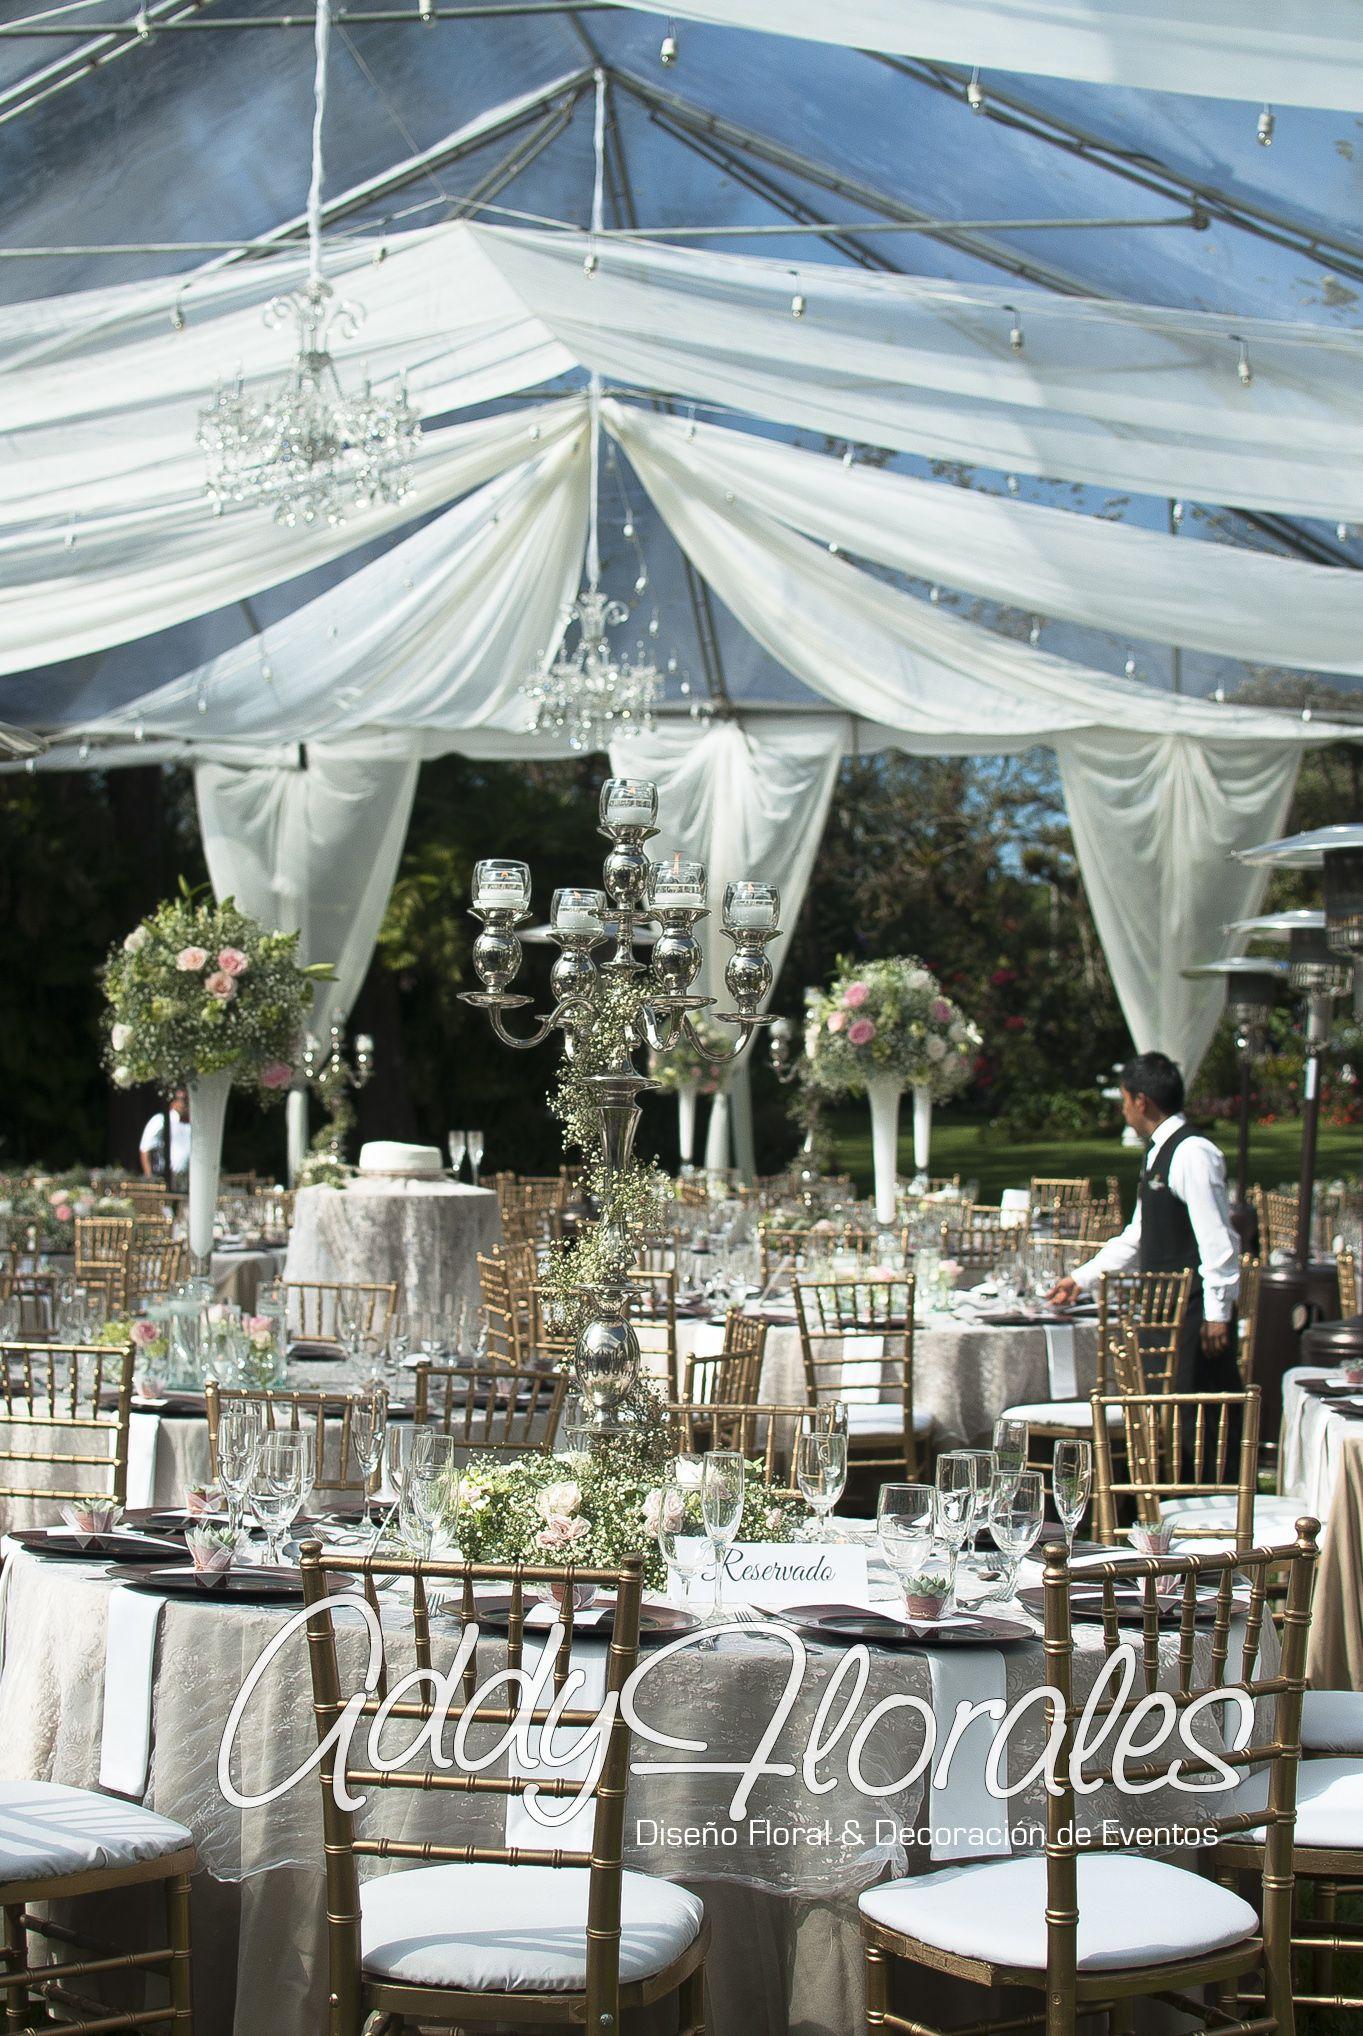 decoration: addy florales #addyflorales #tentdecorationdraped